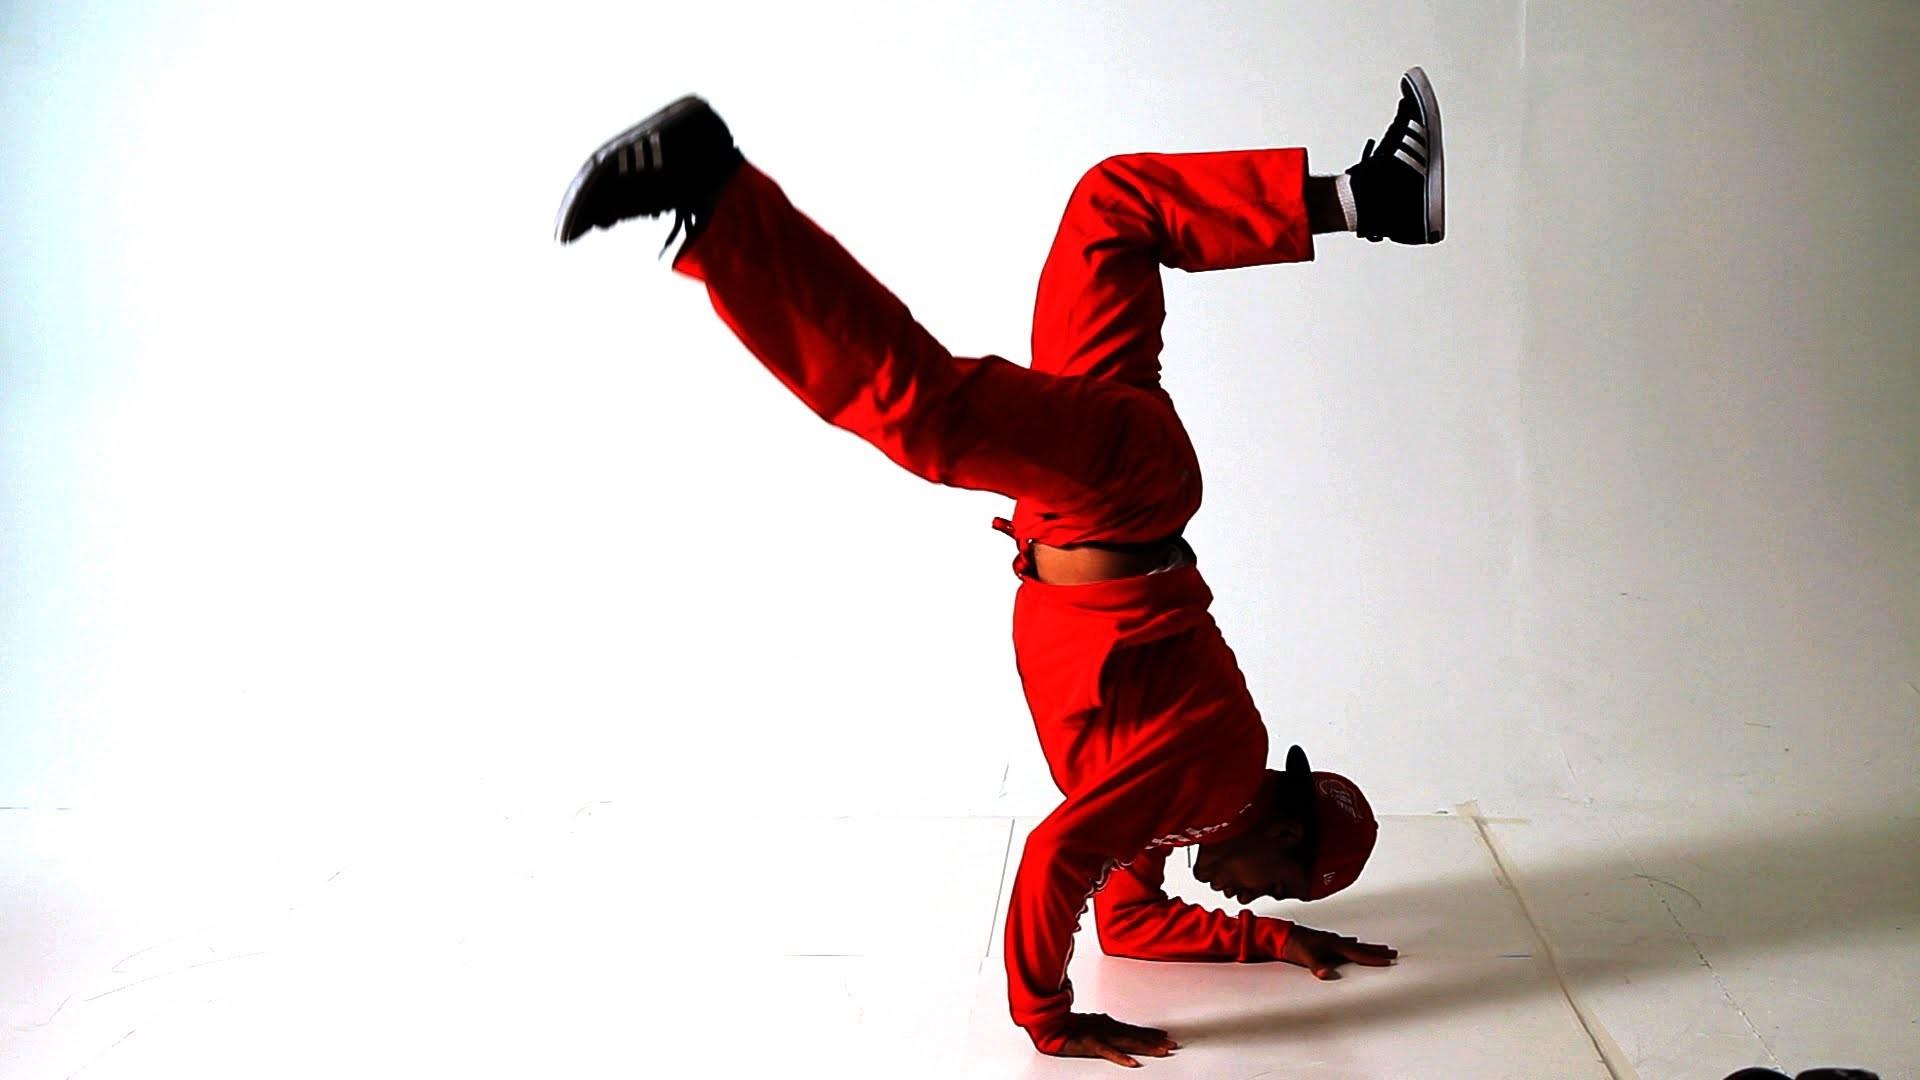 Breakdance  Simple English Wikipedia the free encyclopedia